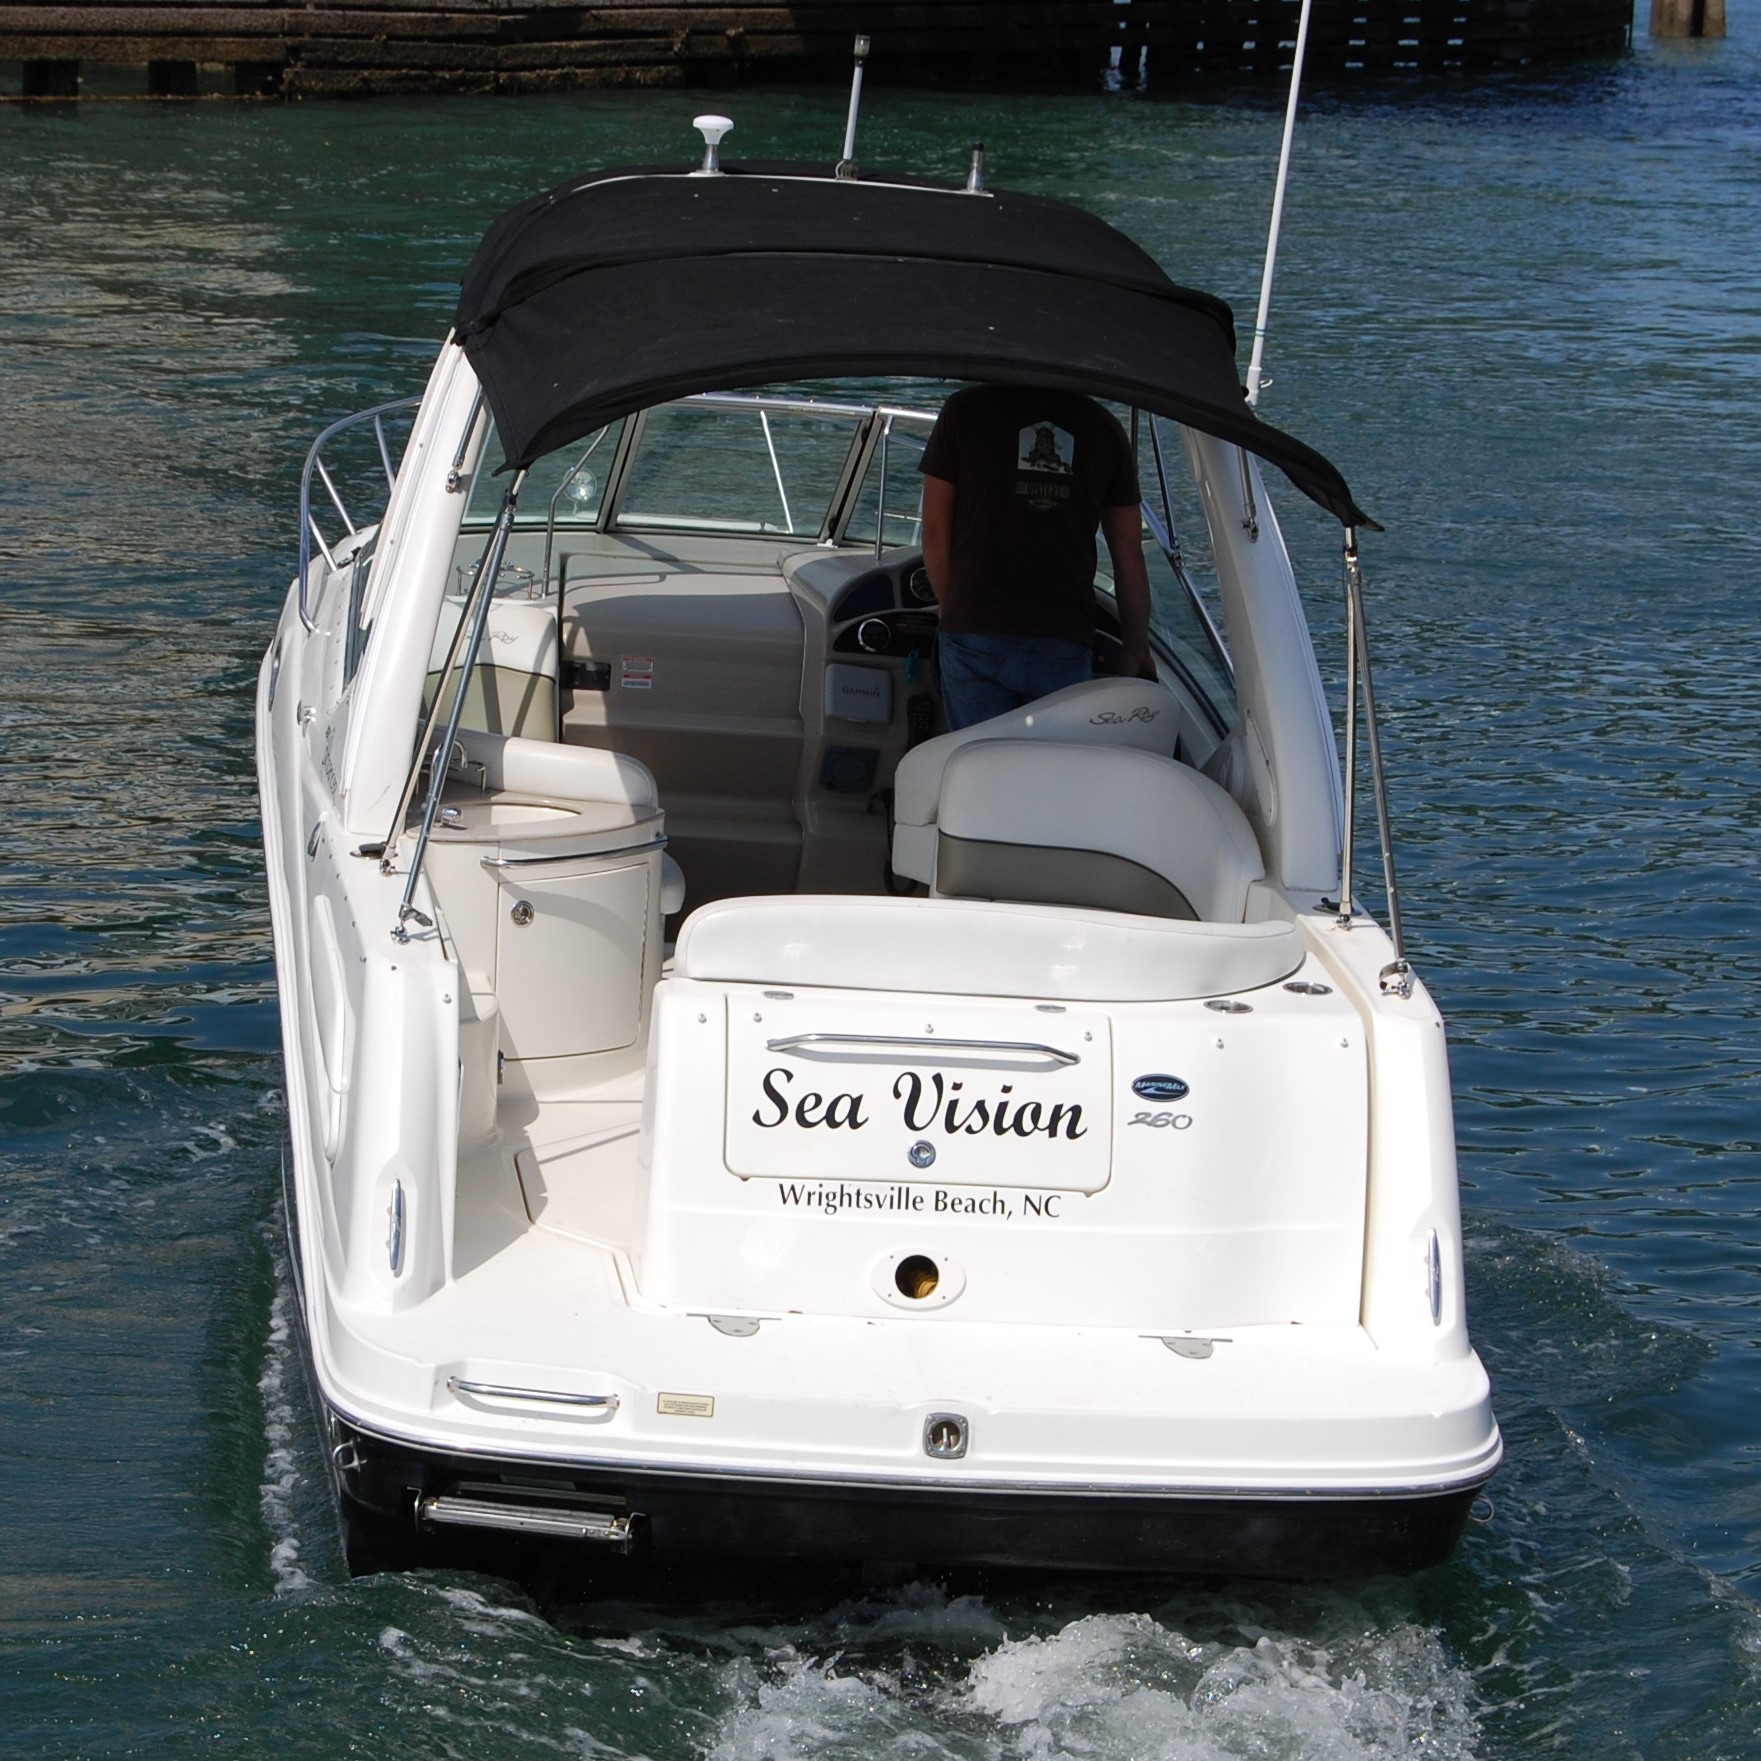 Sea Ray 260 Sundancer – Sea Gate Boating